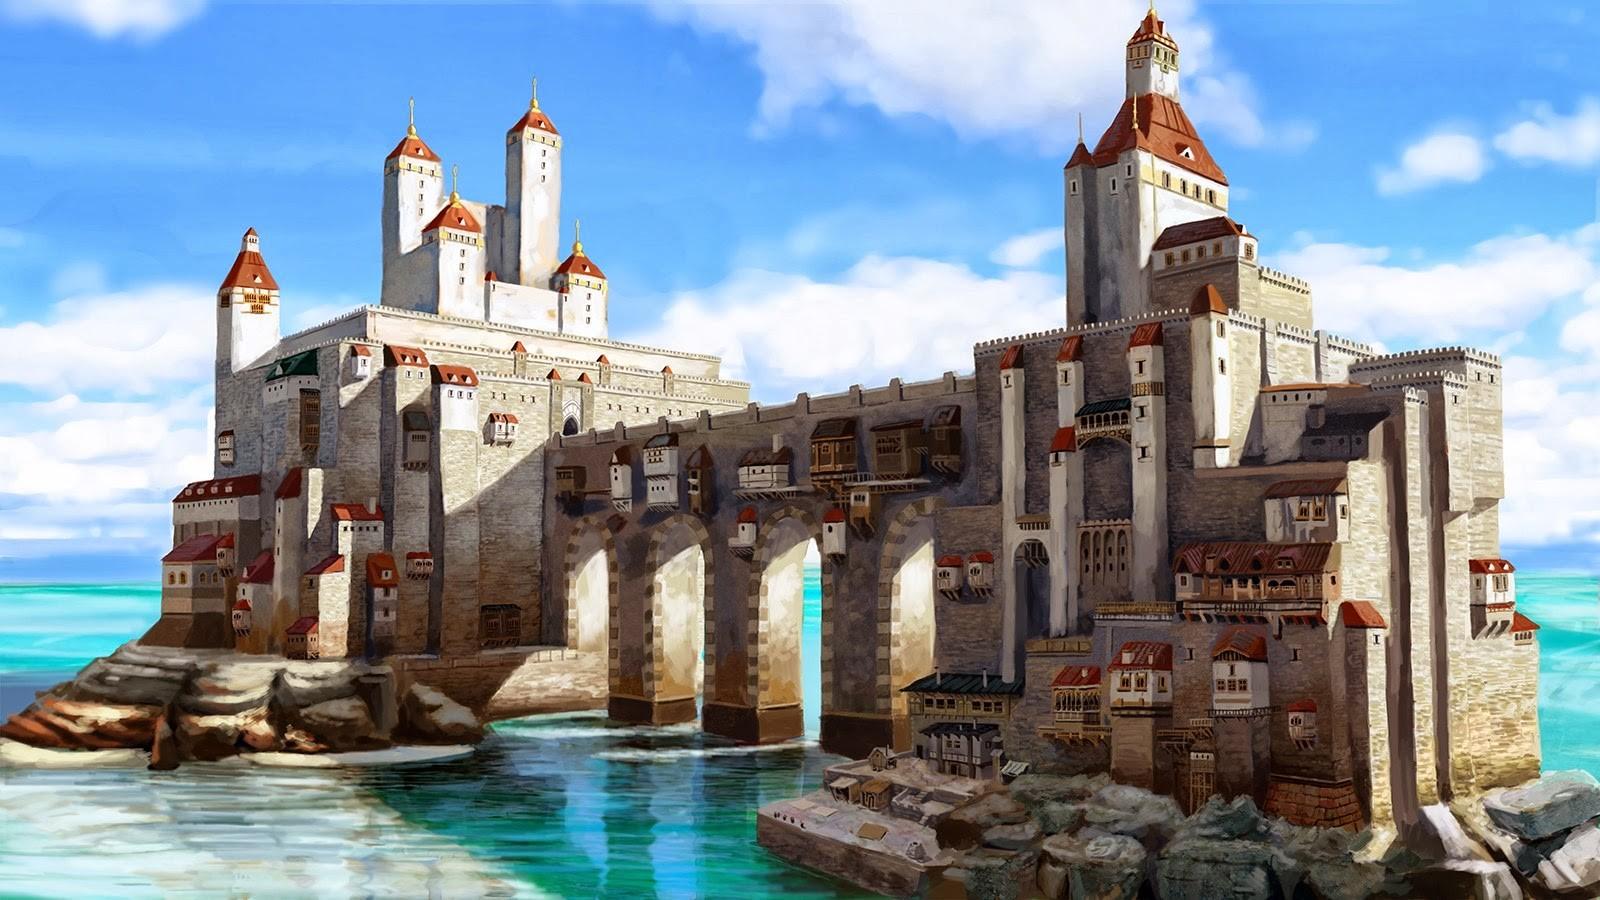 General 1600x900 castle medieval DeviantArt fantasy art